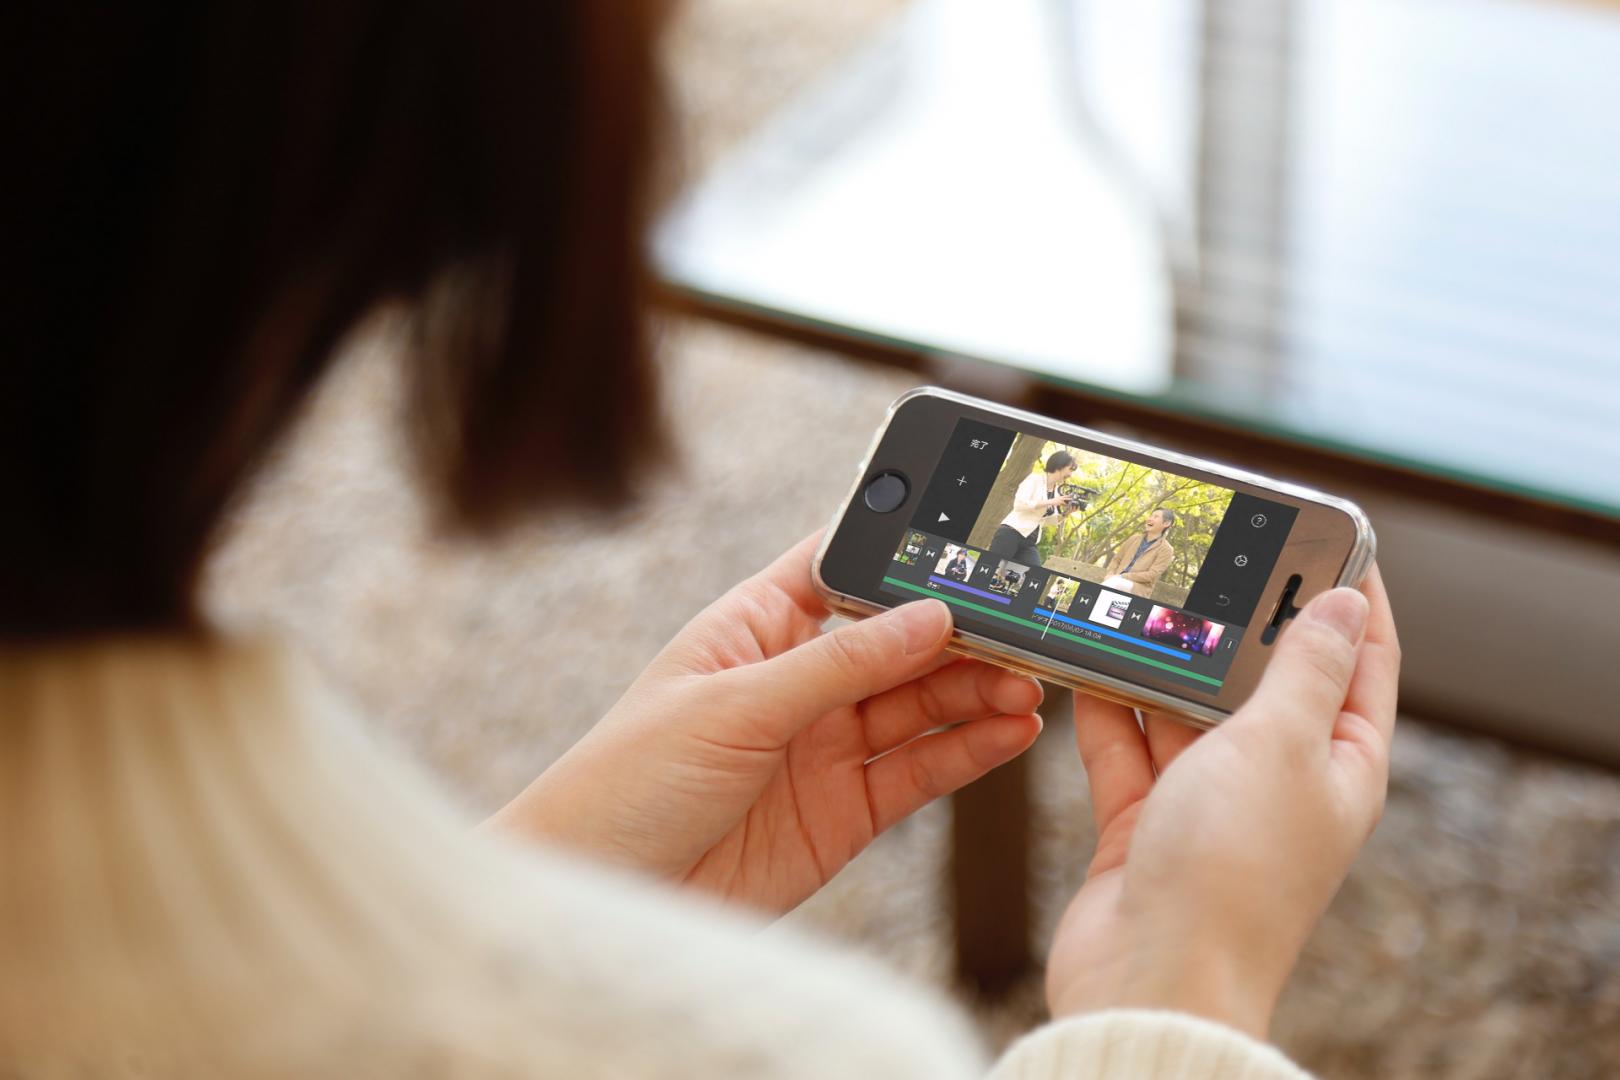 iPhoneでiMovieを使って動画編集する女性